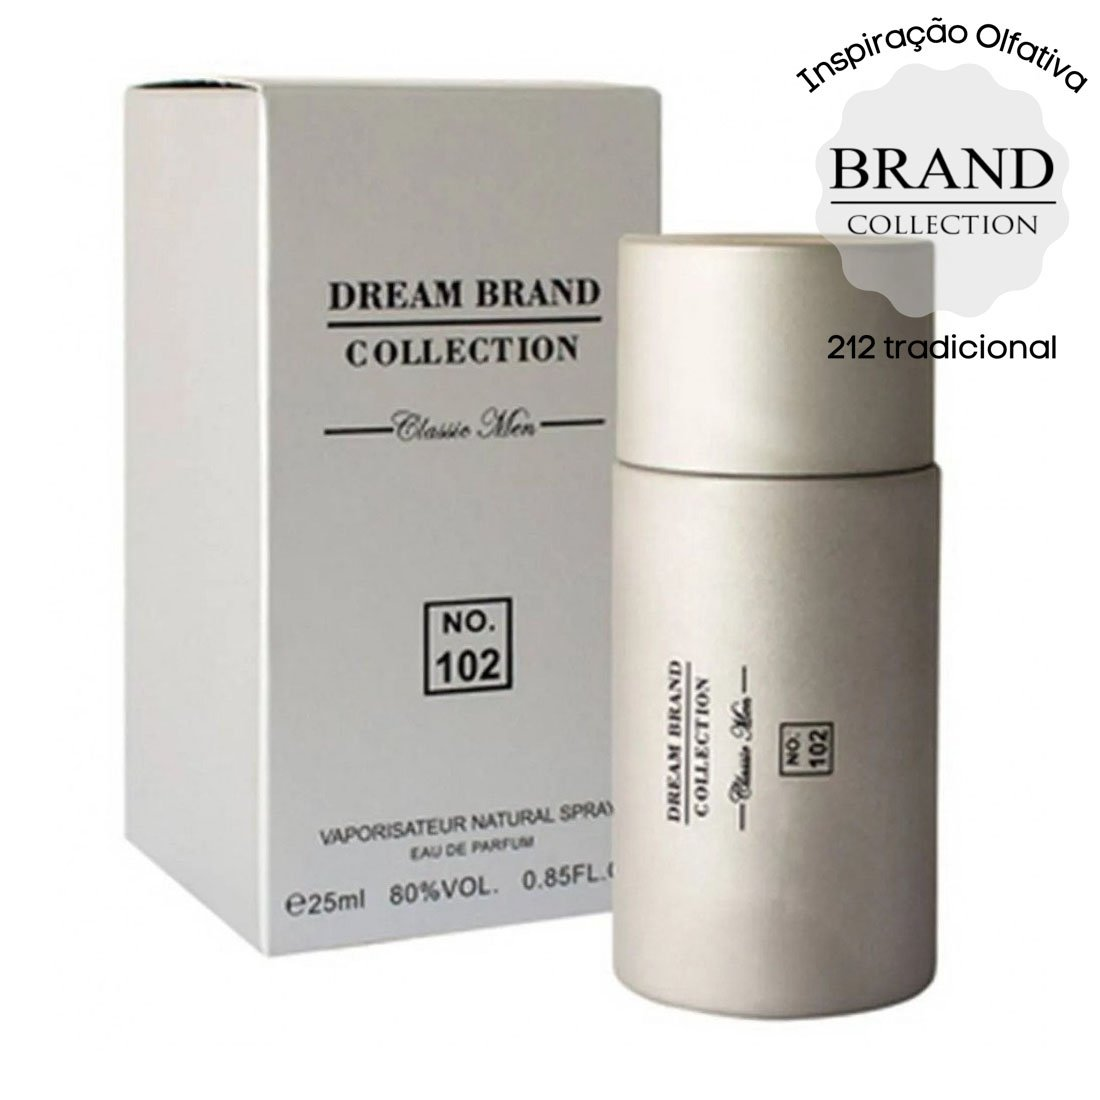 perfume brand collection 102 masculino 25 ml 212 tradicional 51212 2000 203783 1